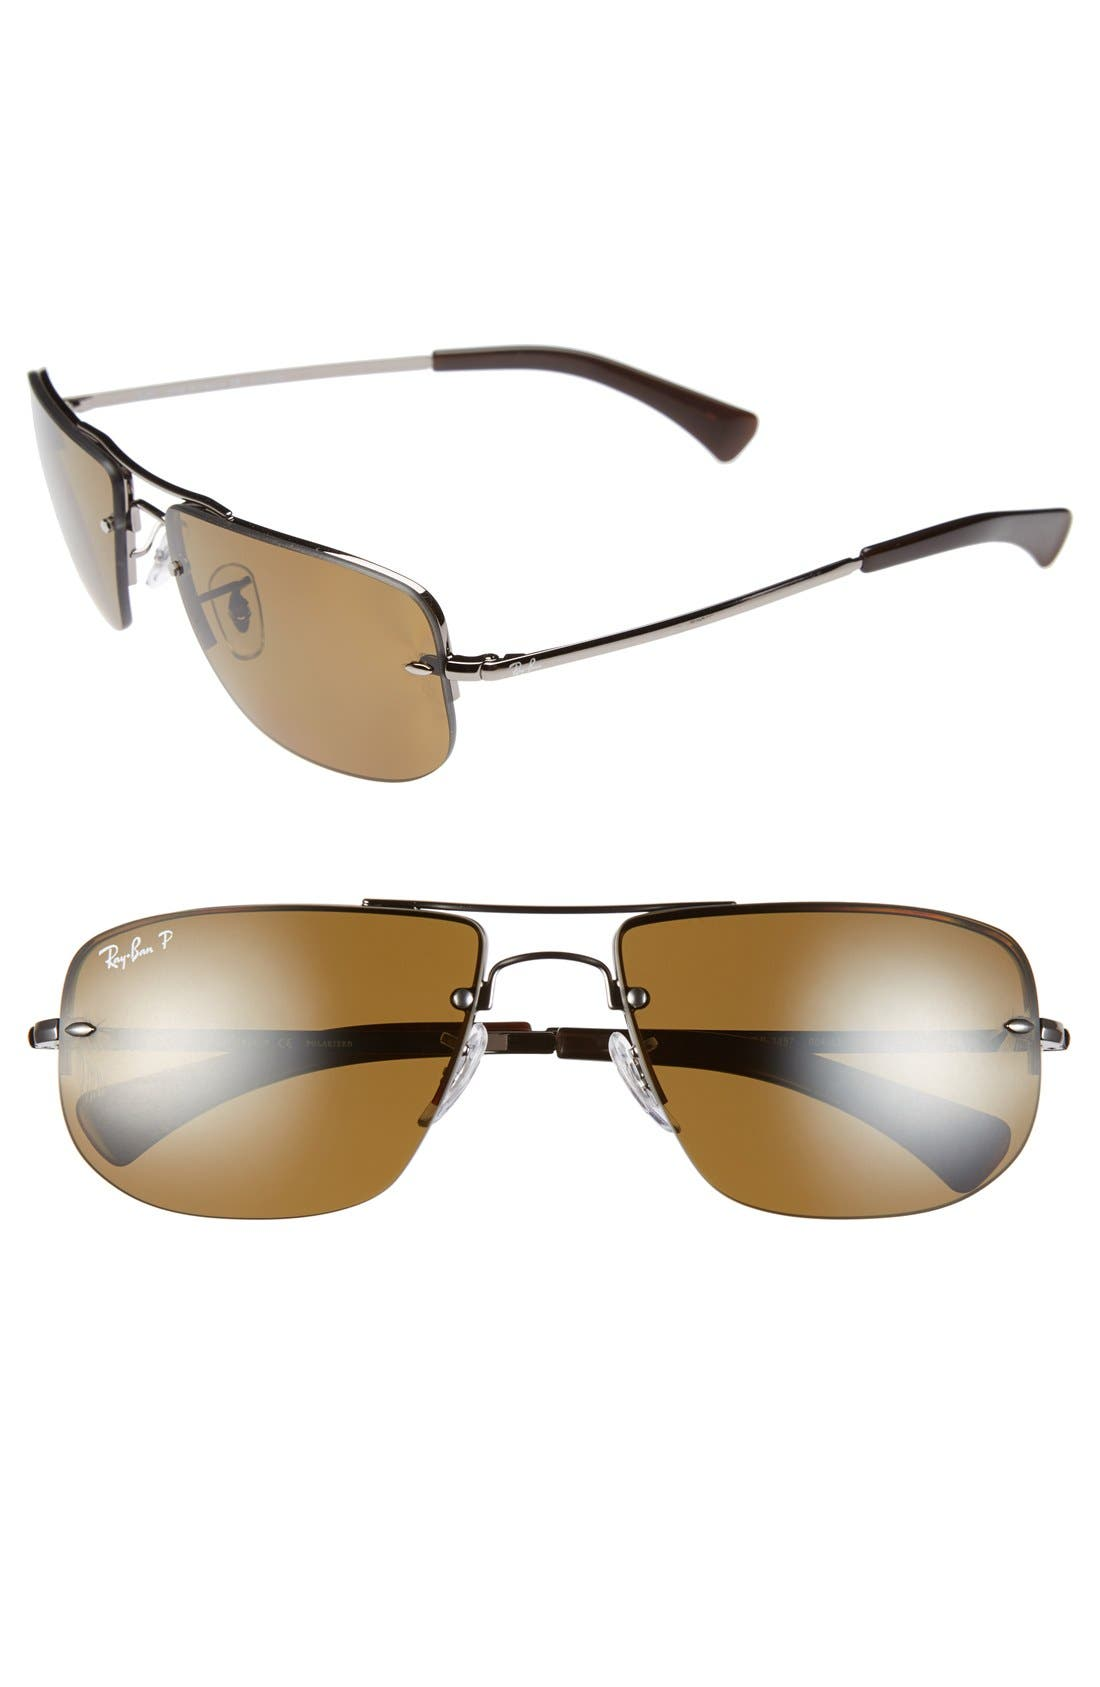 Main Image - Ray-Ban 59mm Polarized Semi Rimless Sunglasses